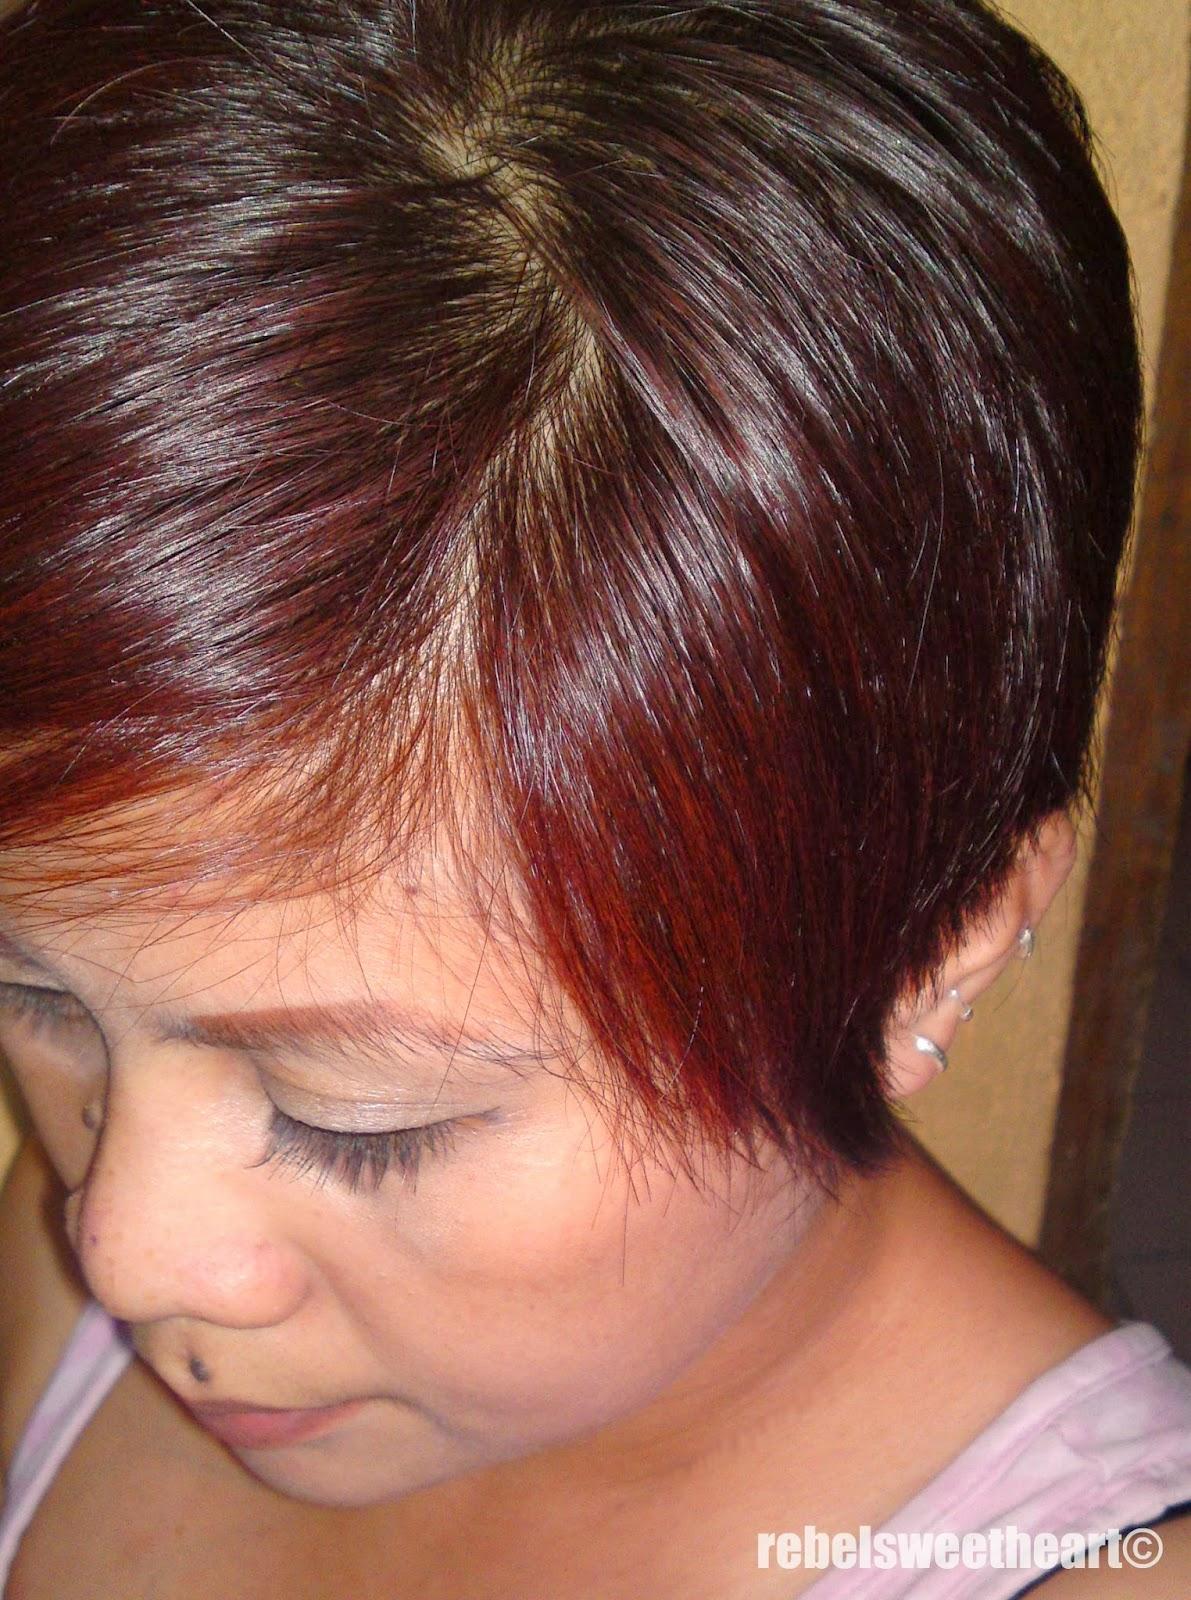 The Rebel Sweetheart Hair Story Tony Moly Berry Trendy Hair